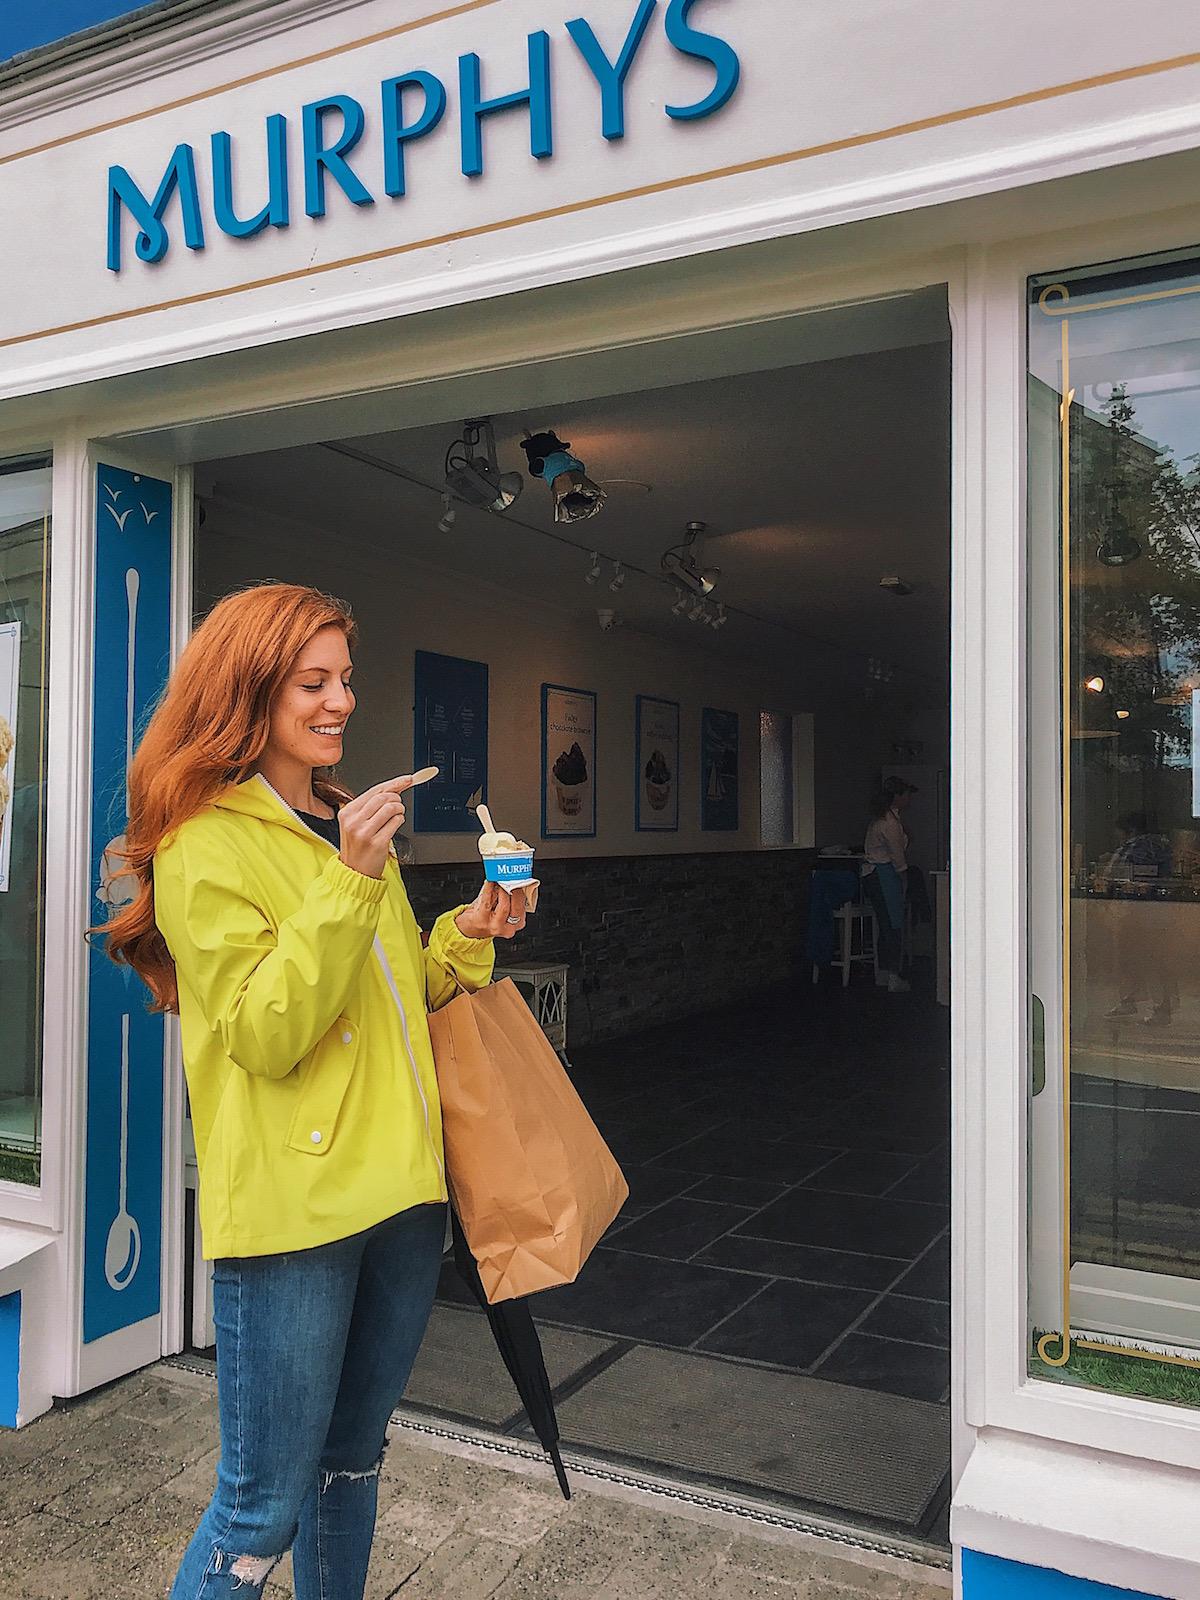 redhead-round-the-world-blogger-ireland-destinations-murphys-dingle-ice-cream.JPG